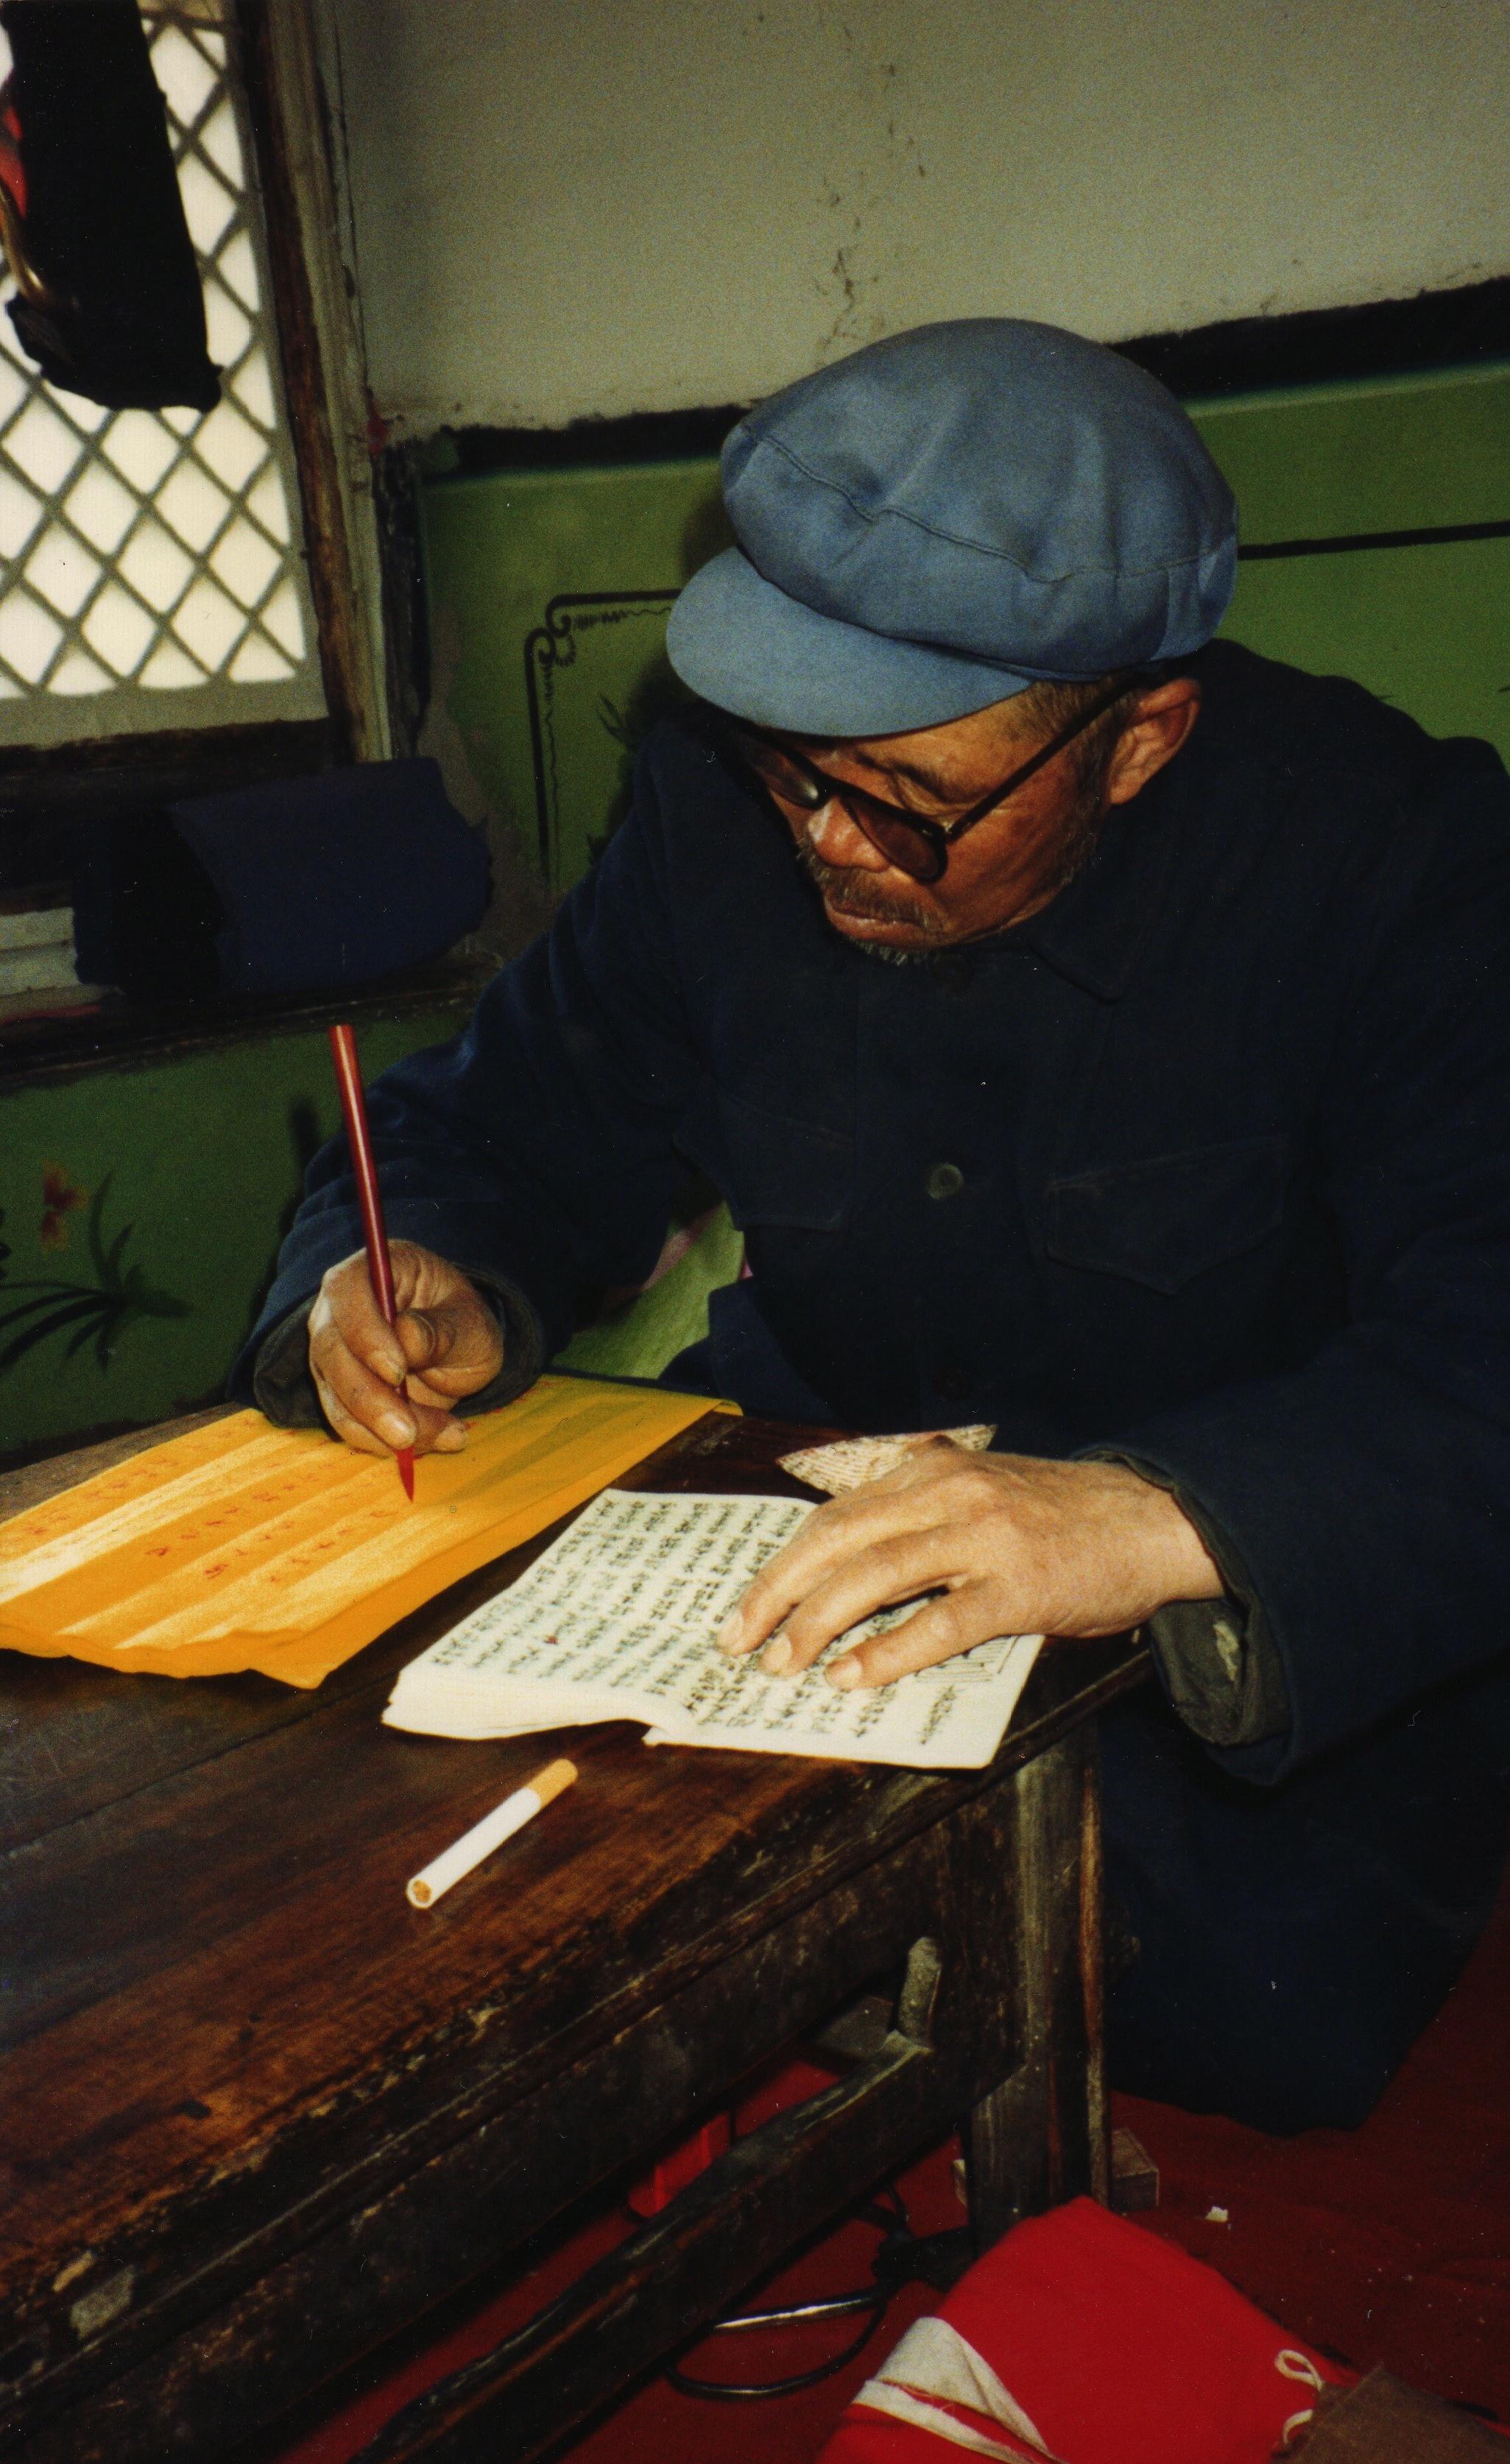 Li Qing copying ritual document, 1991